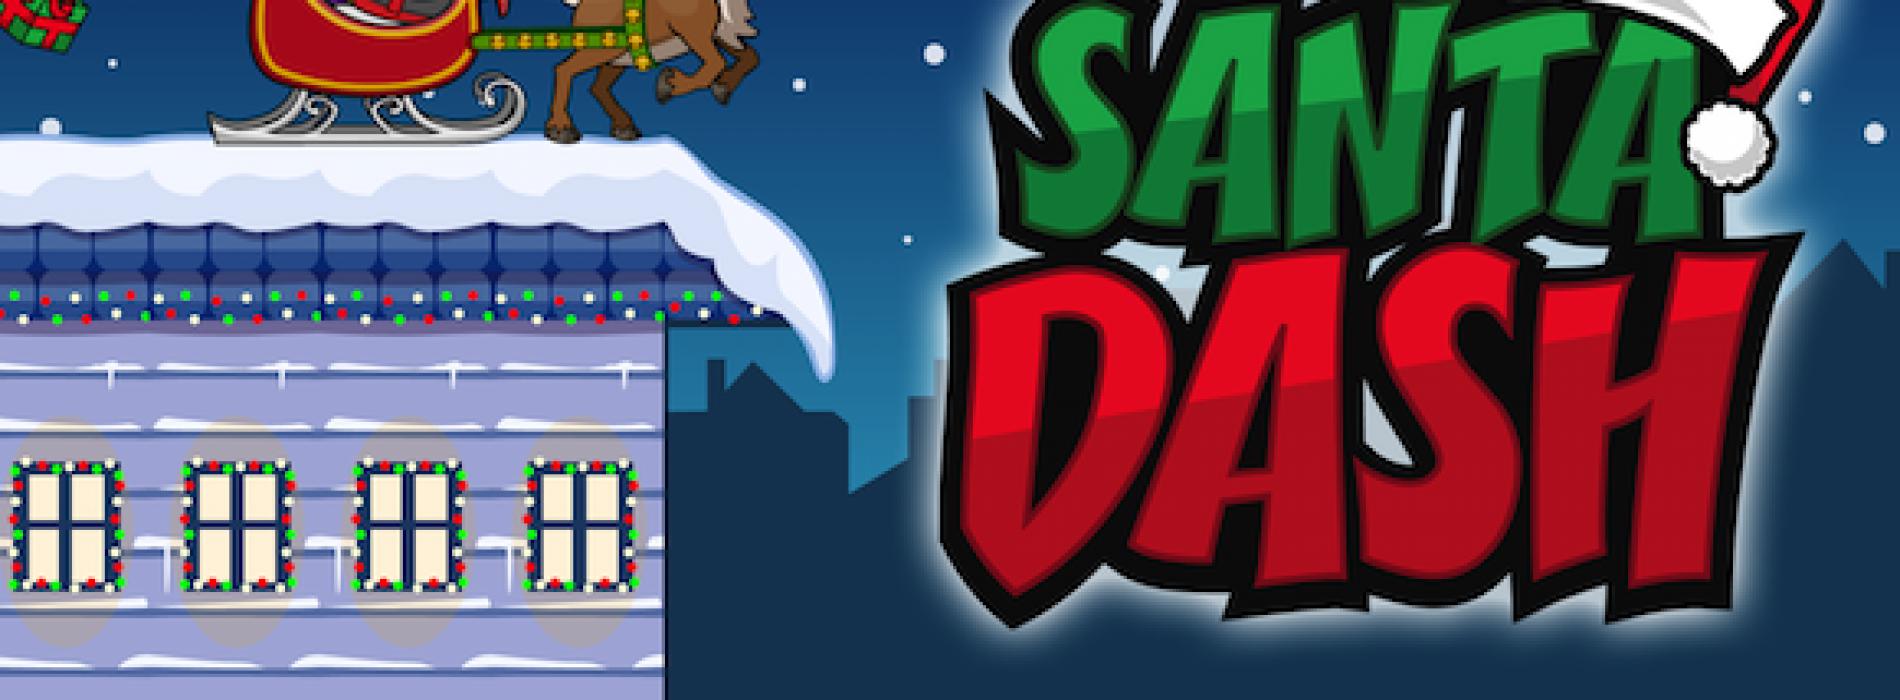 Santa Dash helps pass the time this holiday season